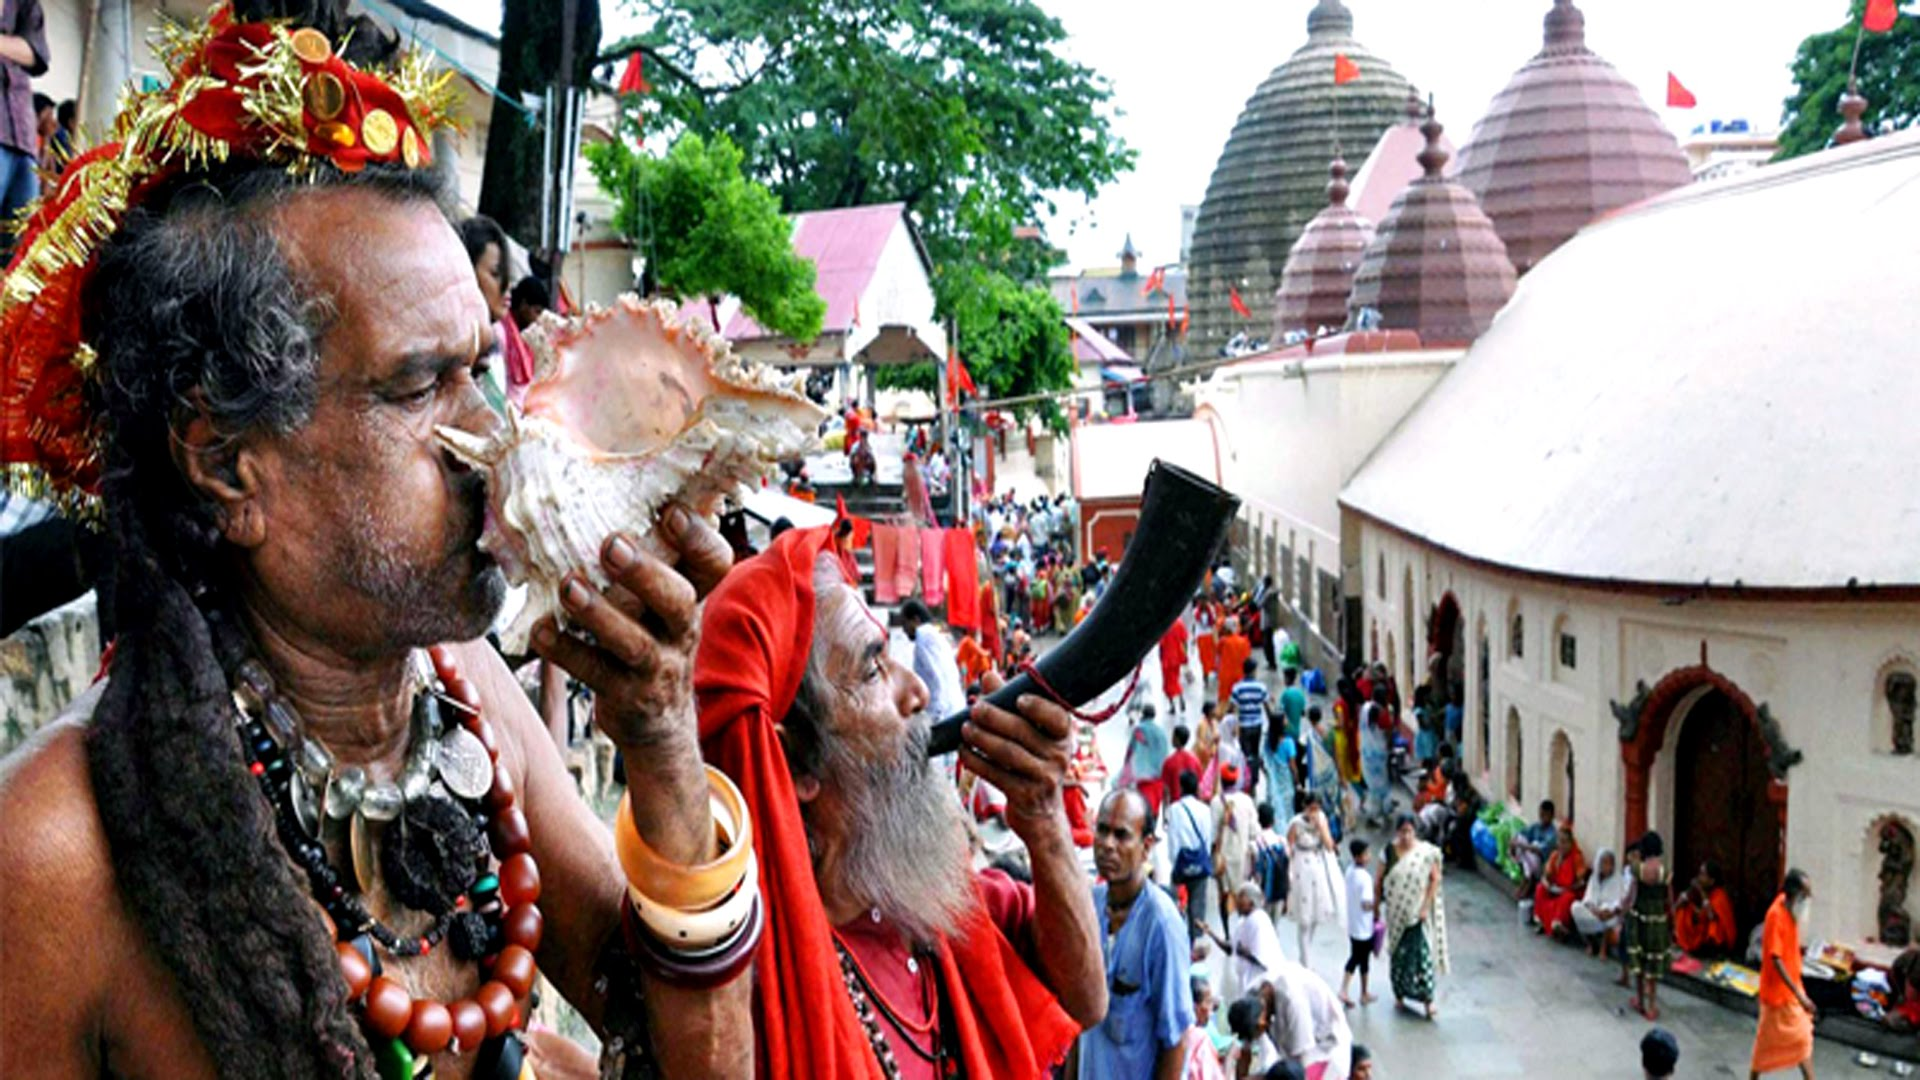 Ambubachi: The Greatest Celebration of Shakti